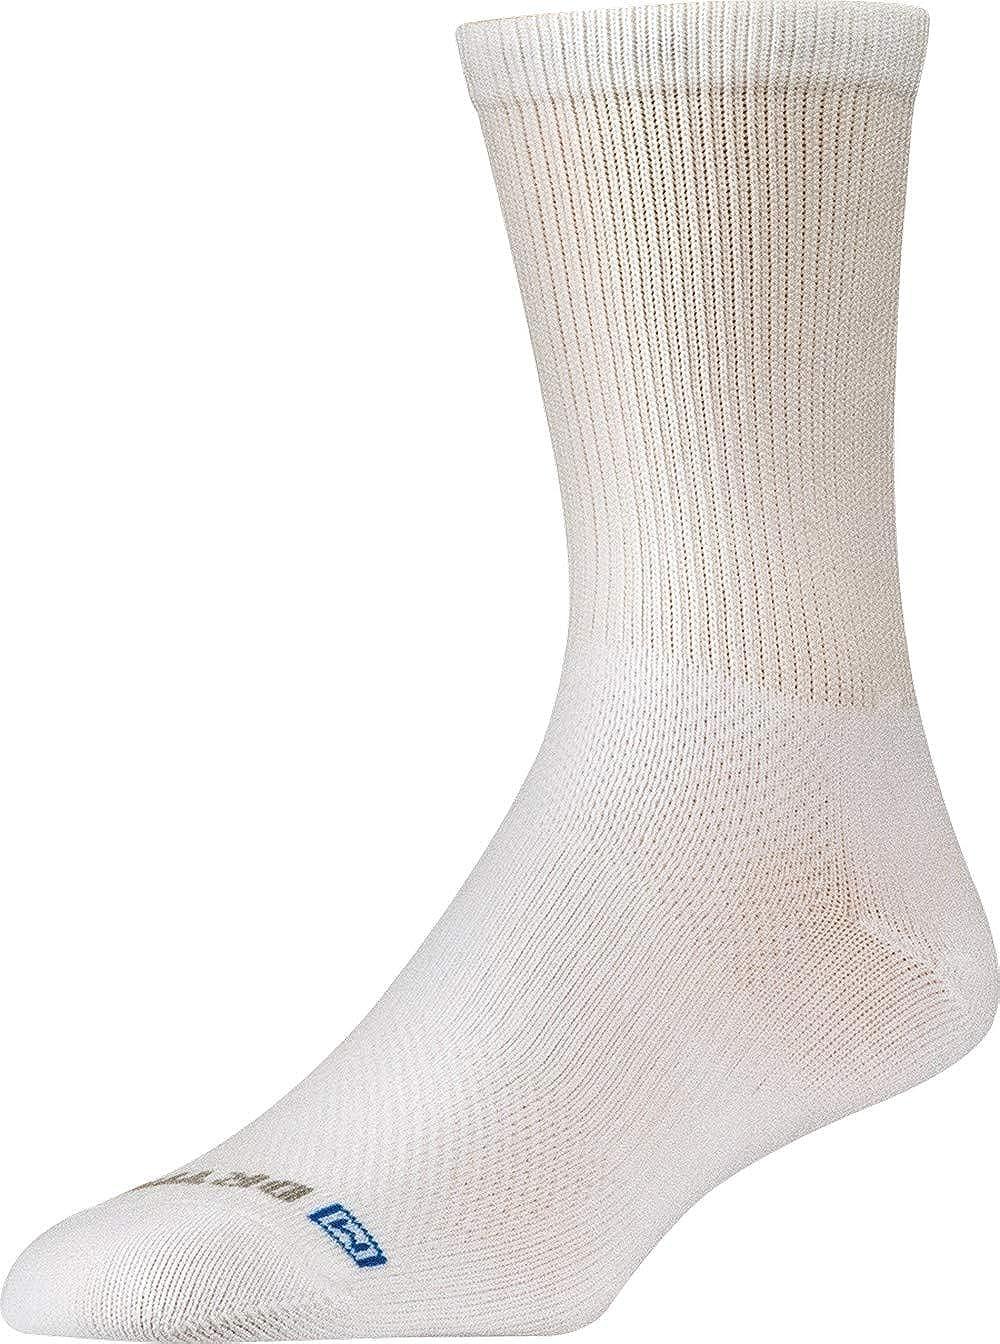 Drymax Cycle Crew Socks